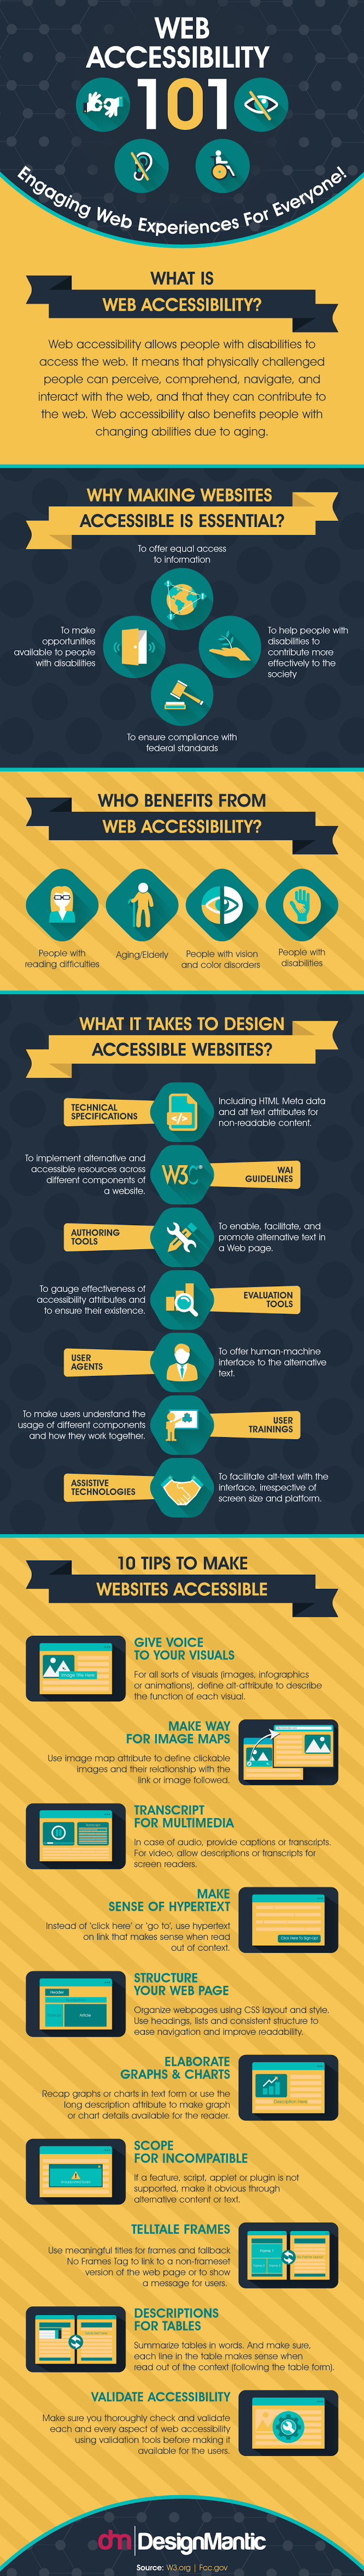 Accessibility Webdesign Web Design Usability Ux Web Accessibility Business Infographic Web Design Tips